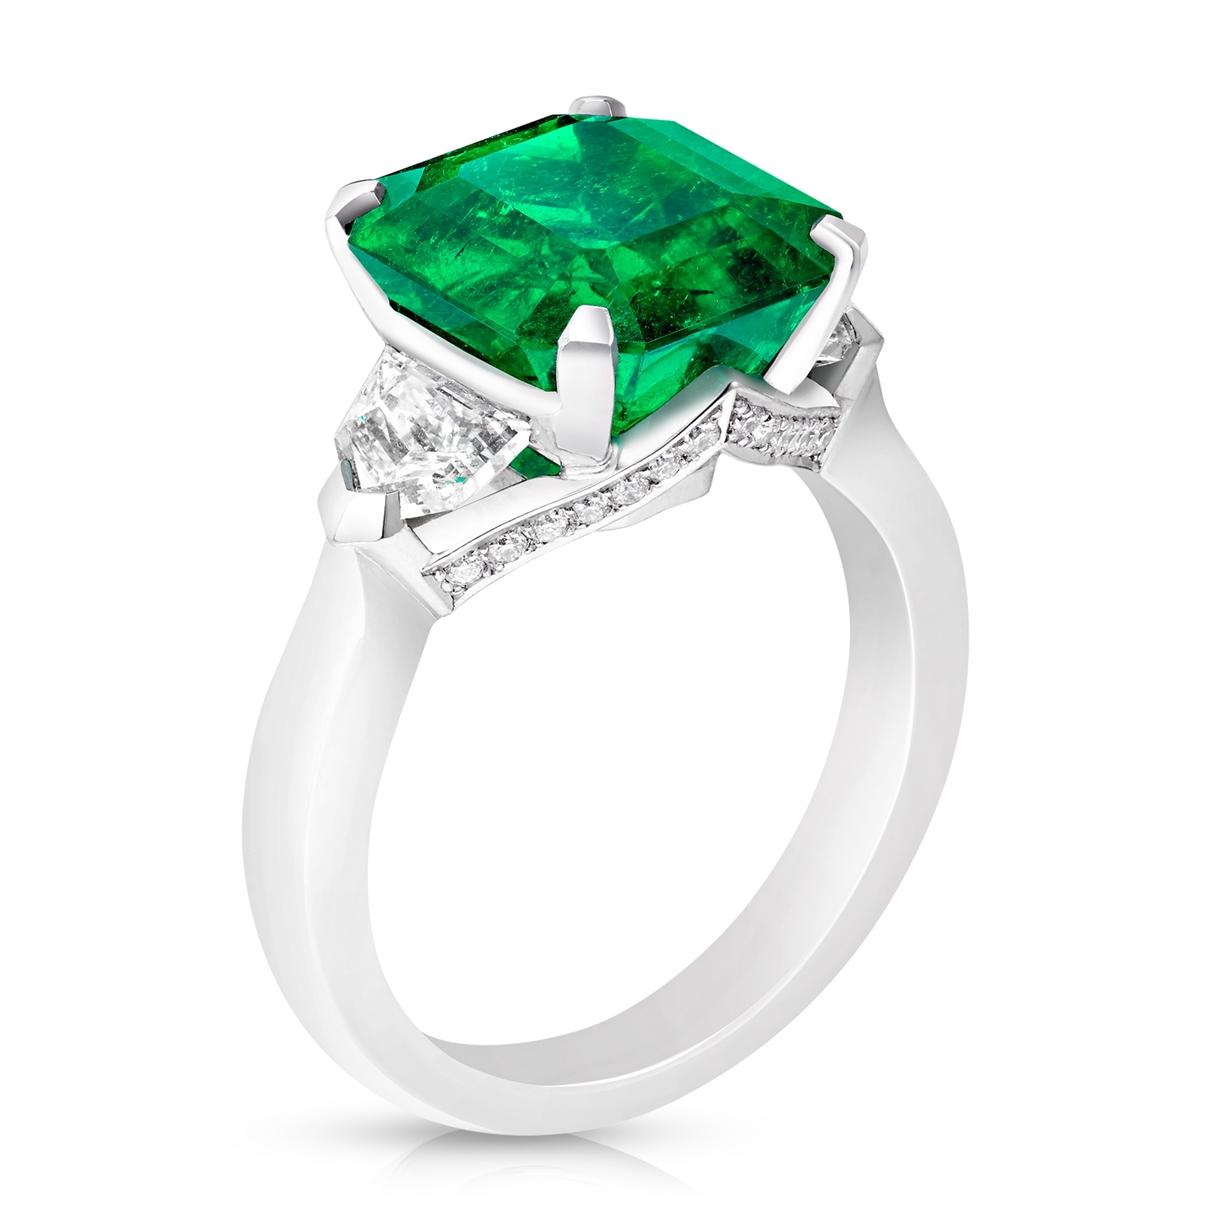 Platinum 5.12ct Step Cut Emerald Ring Set With Diamonds   Fabergé